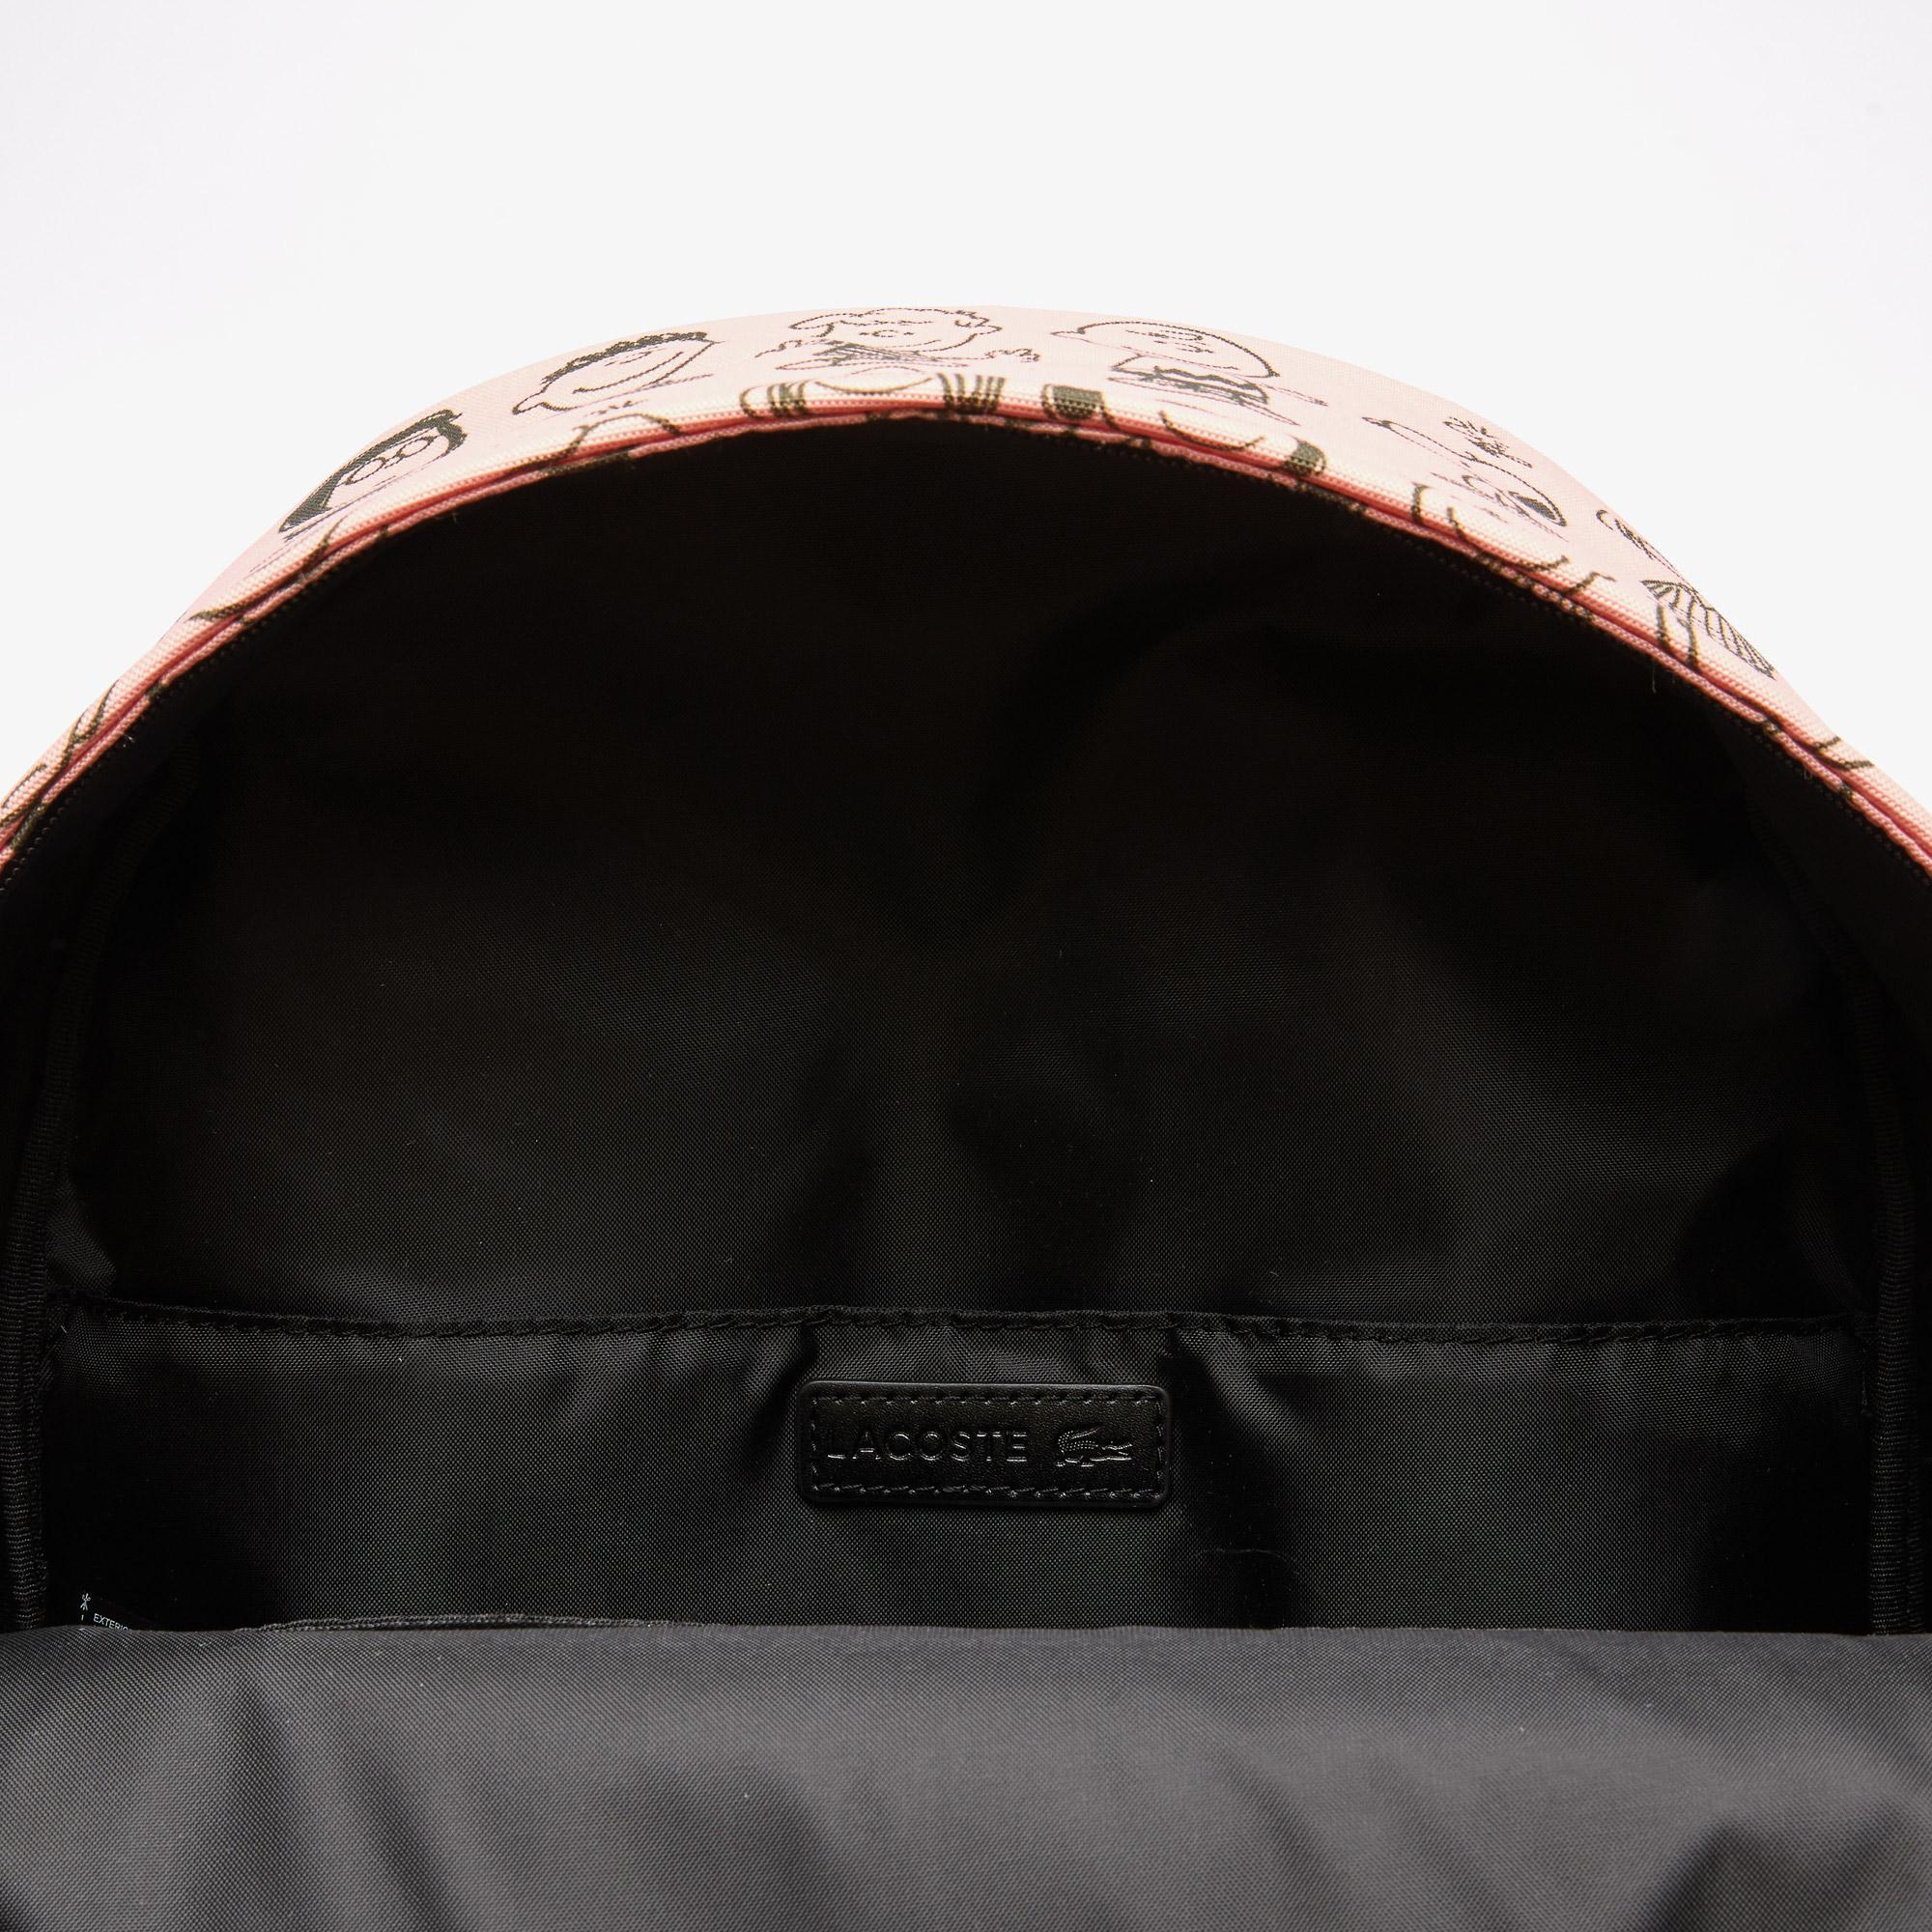 Lacoste x Peanuts Męski płócienny plecak z nadrukiem